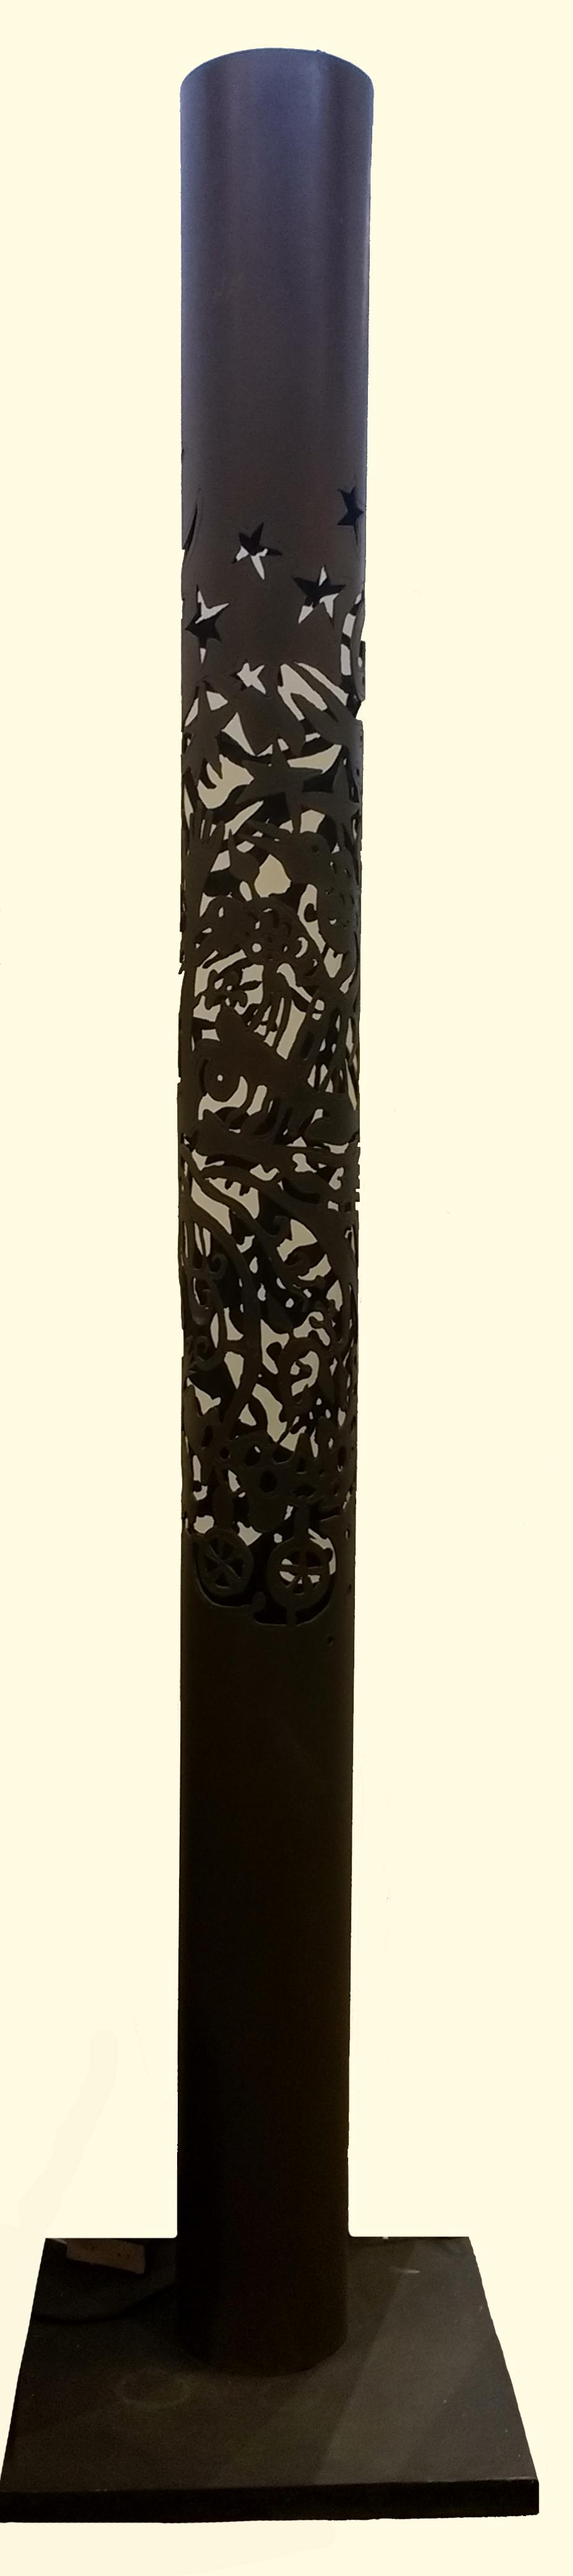 Lámpara Acero corte plasma 248 x 55 x 55